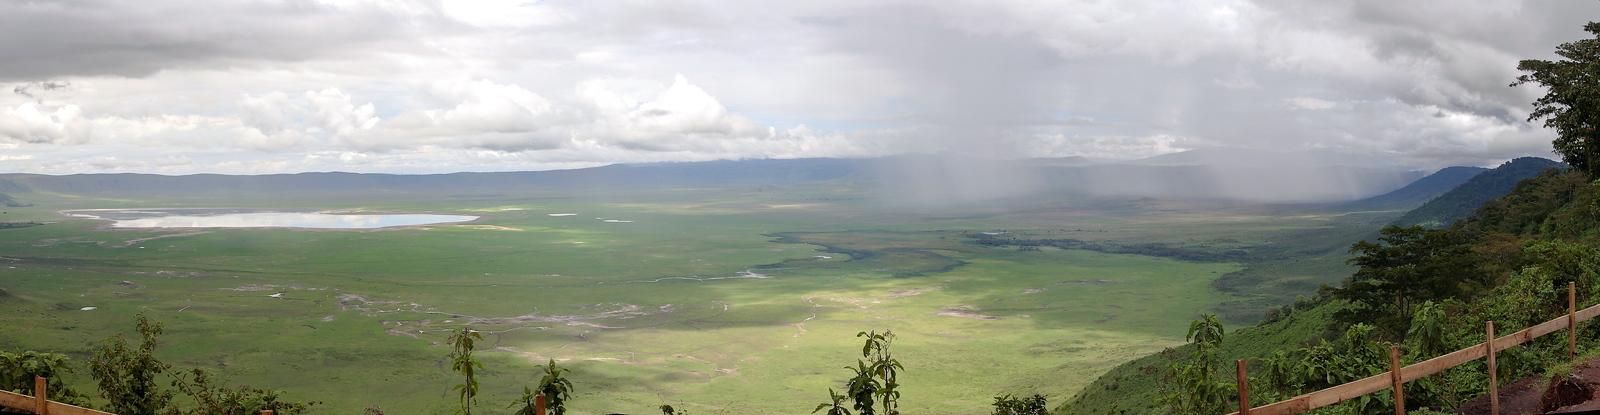 IMAGE: https://photos.smugmug.com/The-Wide-Wide-World/Tanzania/Ngorongoro-Crater/i-FbnBs9h/1/7f3a11f5/X3/00022333-X3.jpg